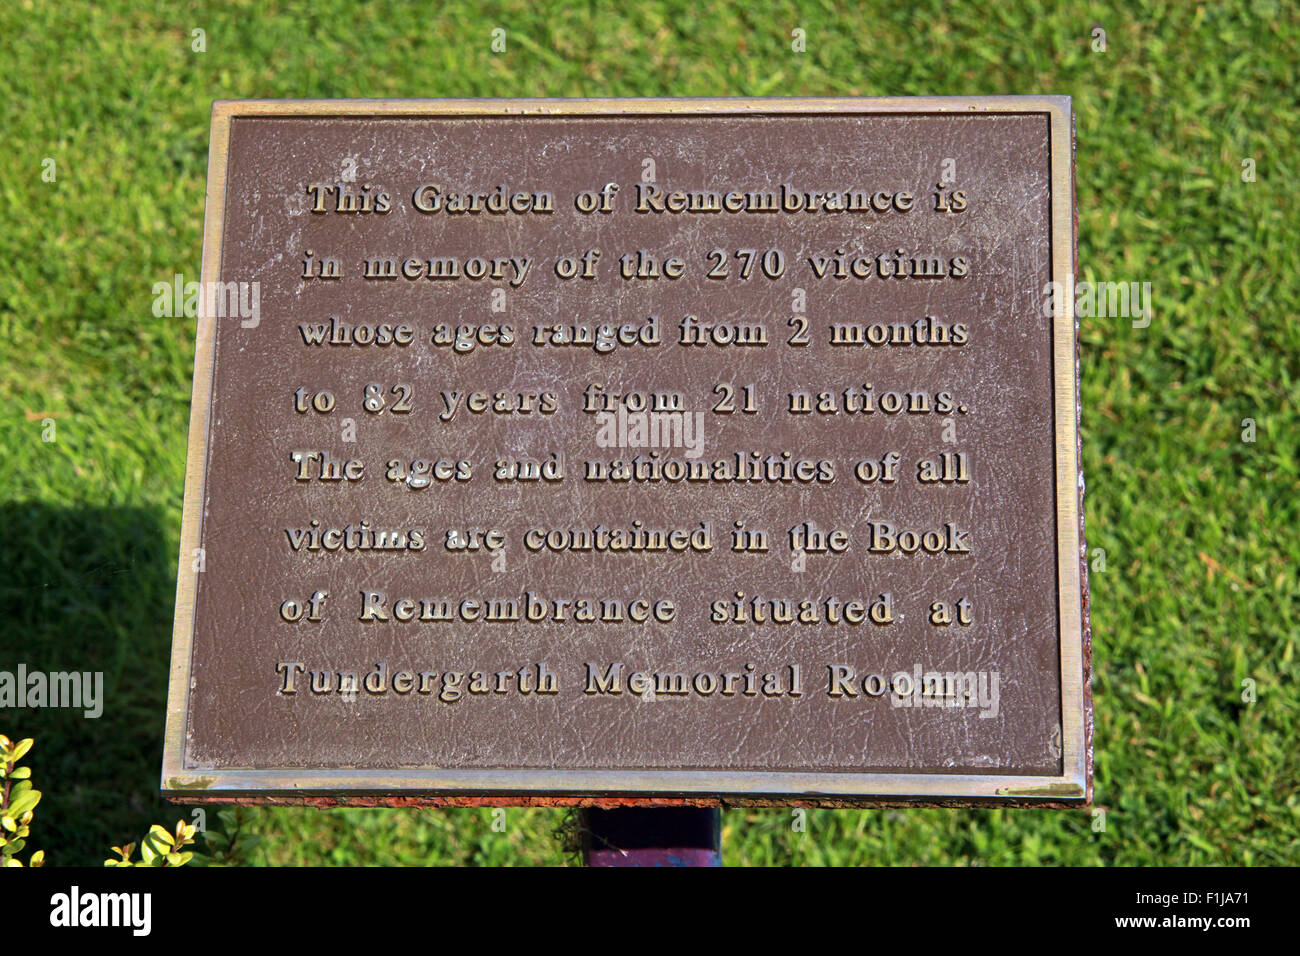 Laden Sie dieses Alamy Stockfoto Plaque Lockerbie PanAm103 Memorial, Schottland - F1JA71